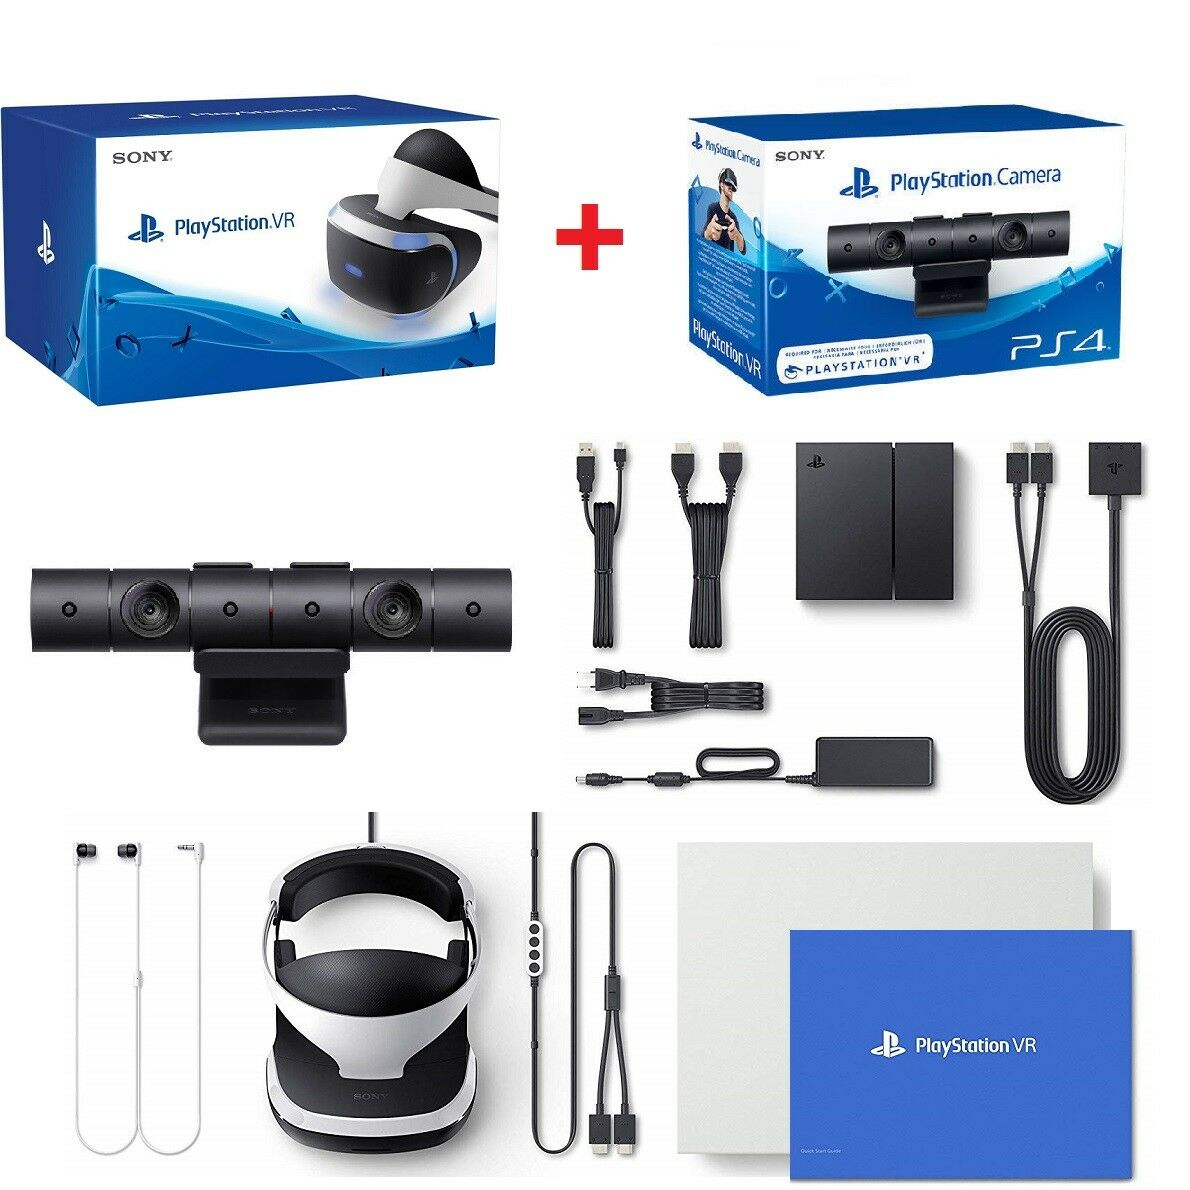 Ebay Uk: Sony Playstation VR Headset PS VR Virtual Reality